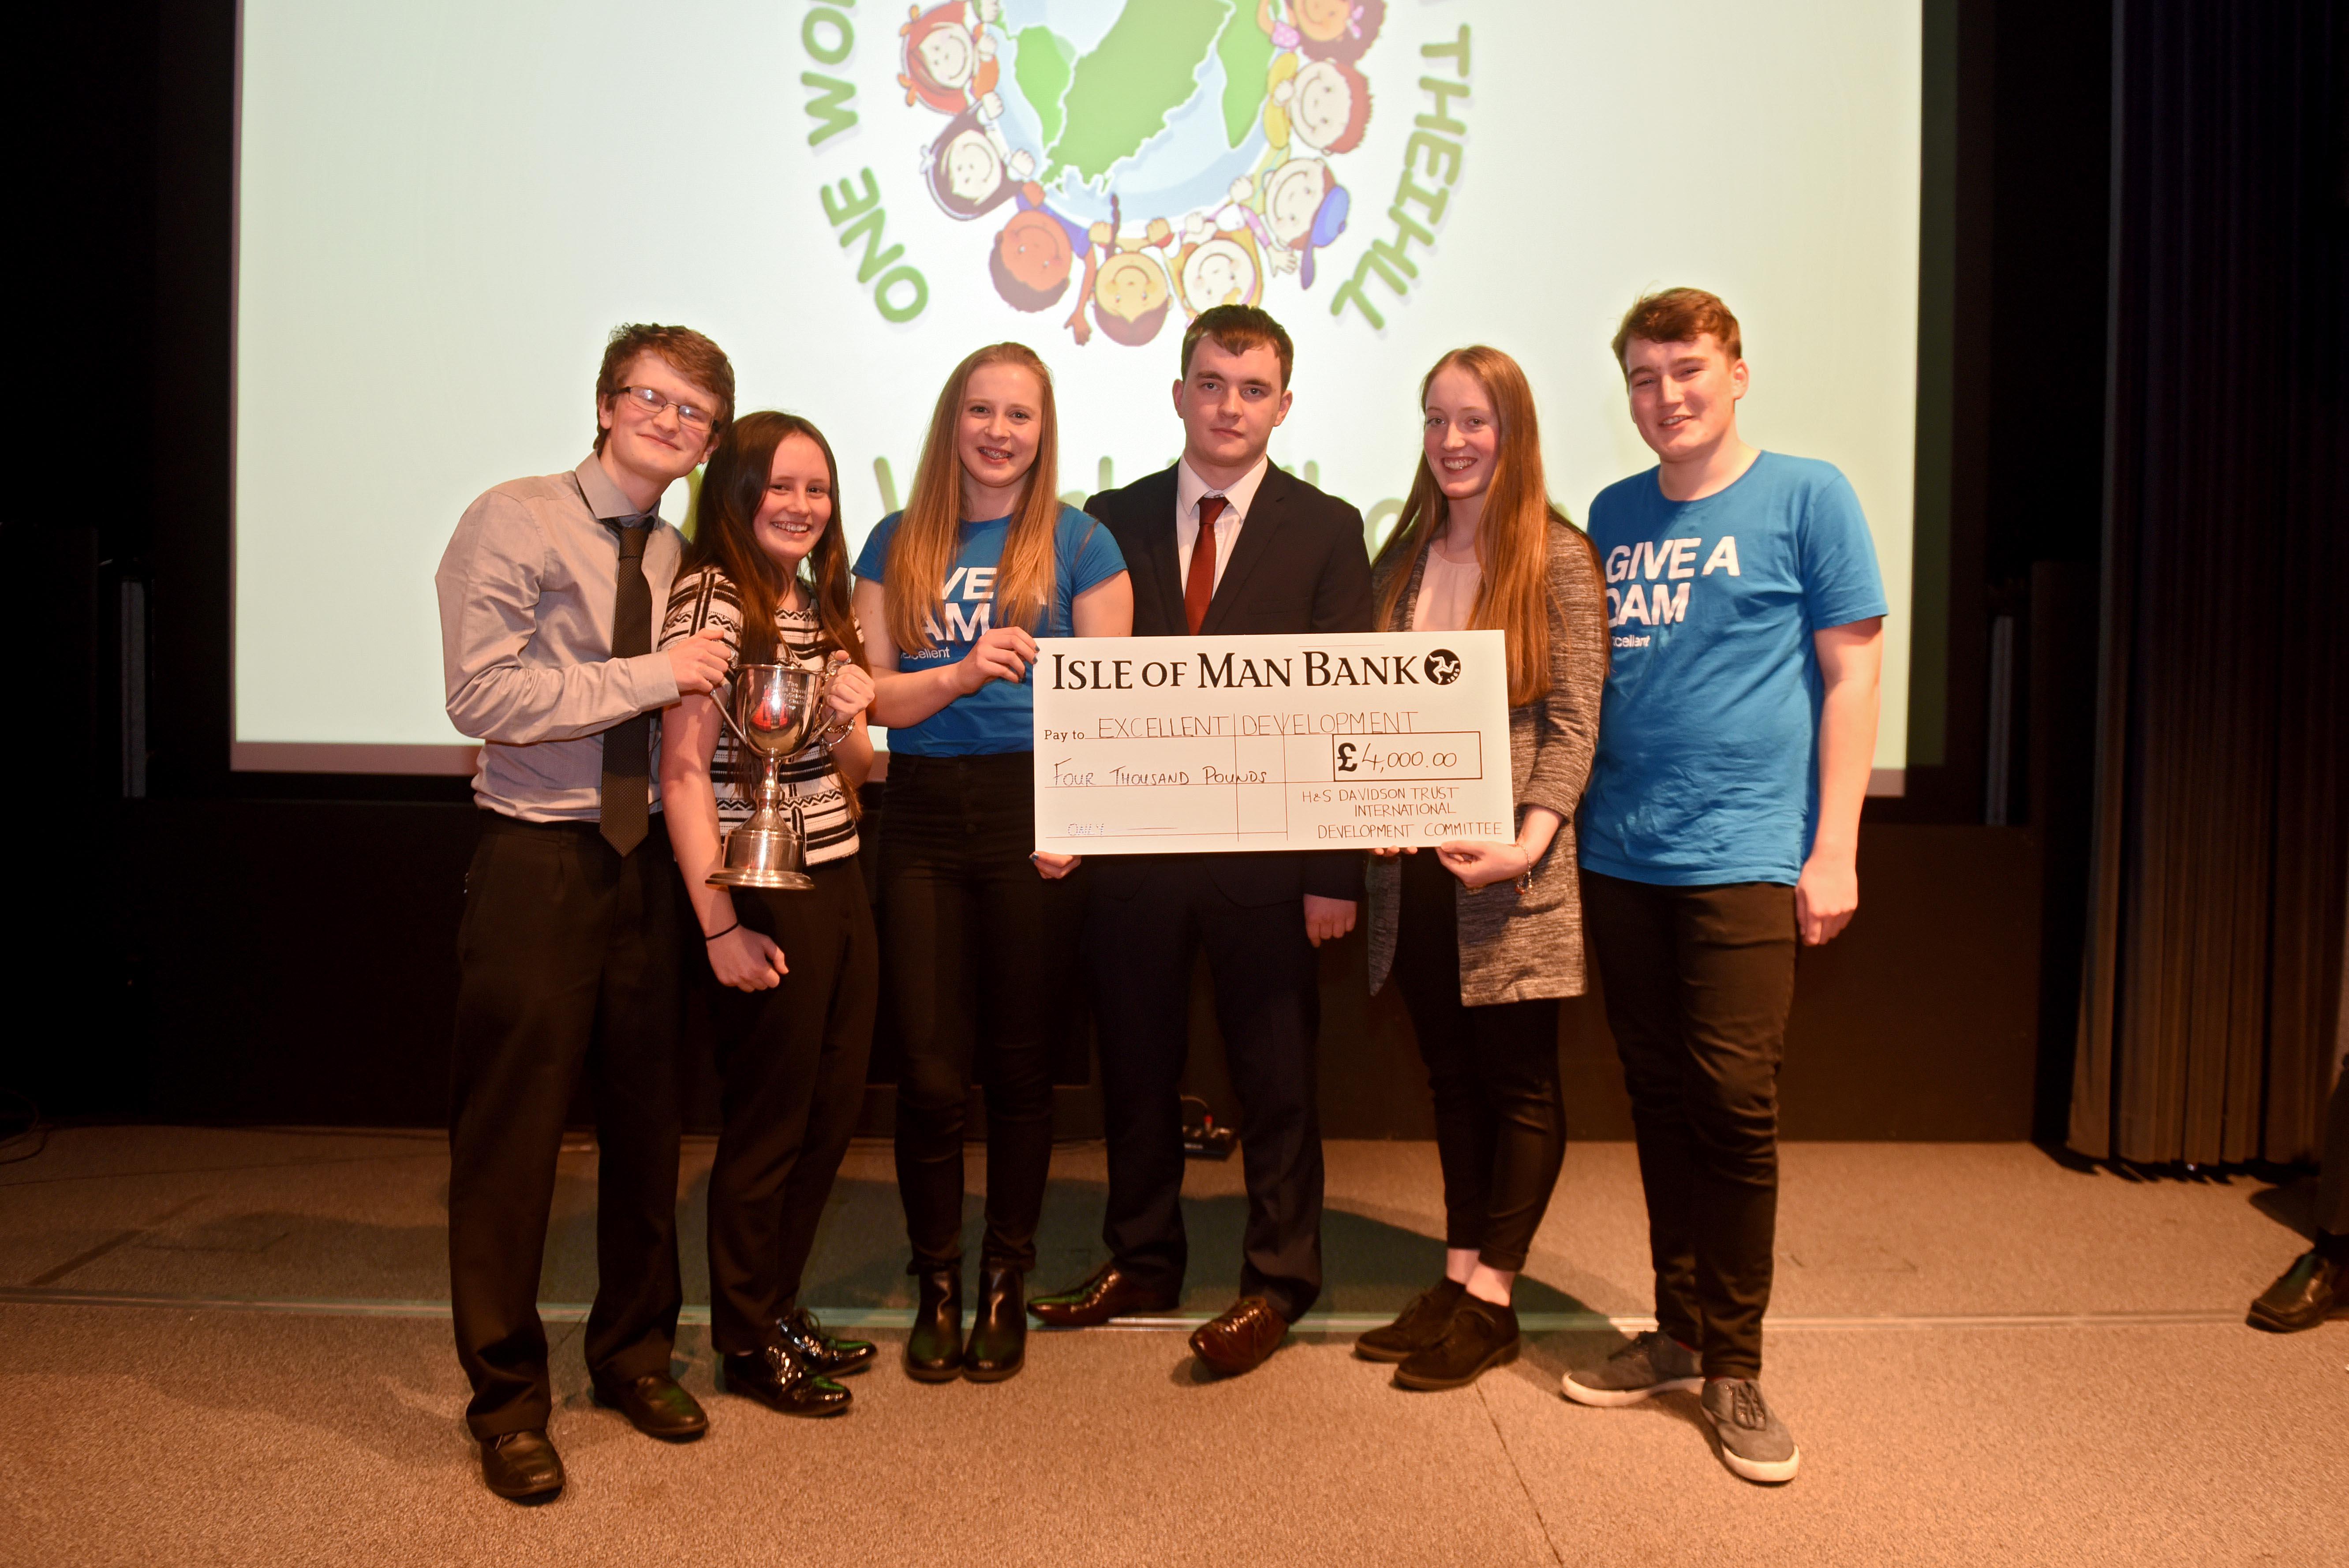 The winning team from Ramsey Grammar School